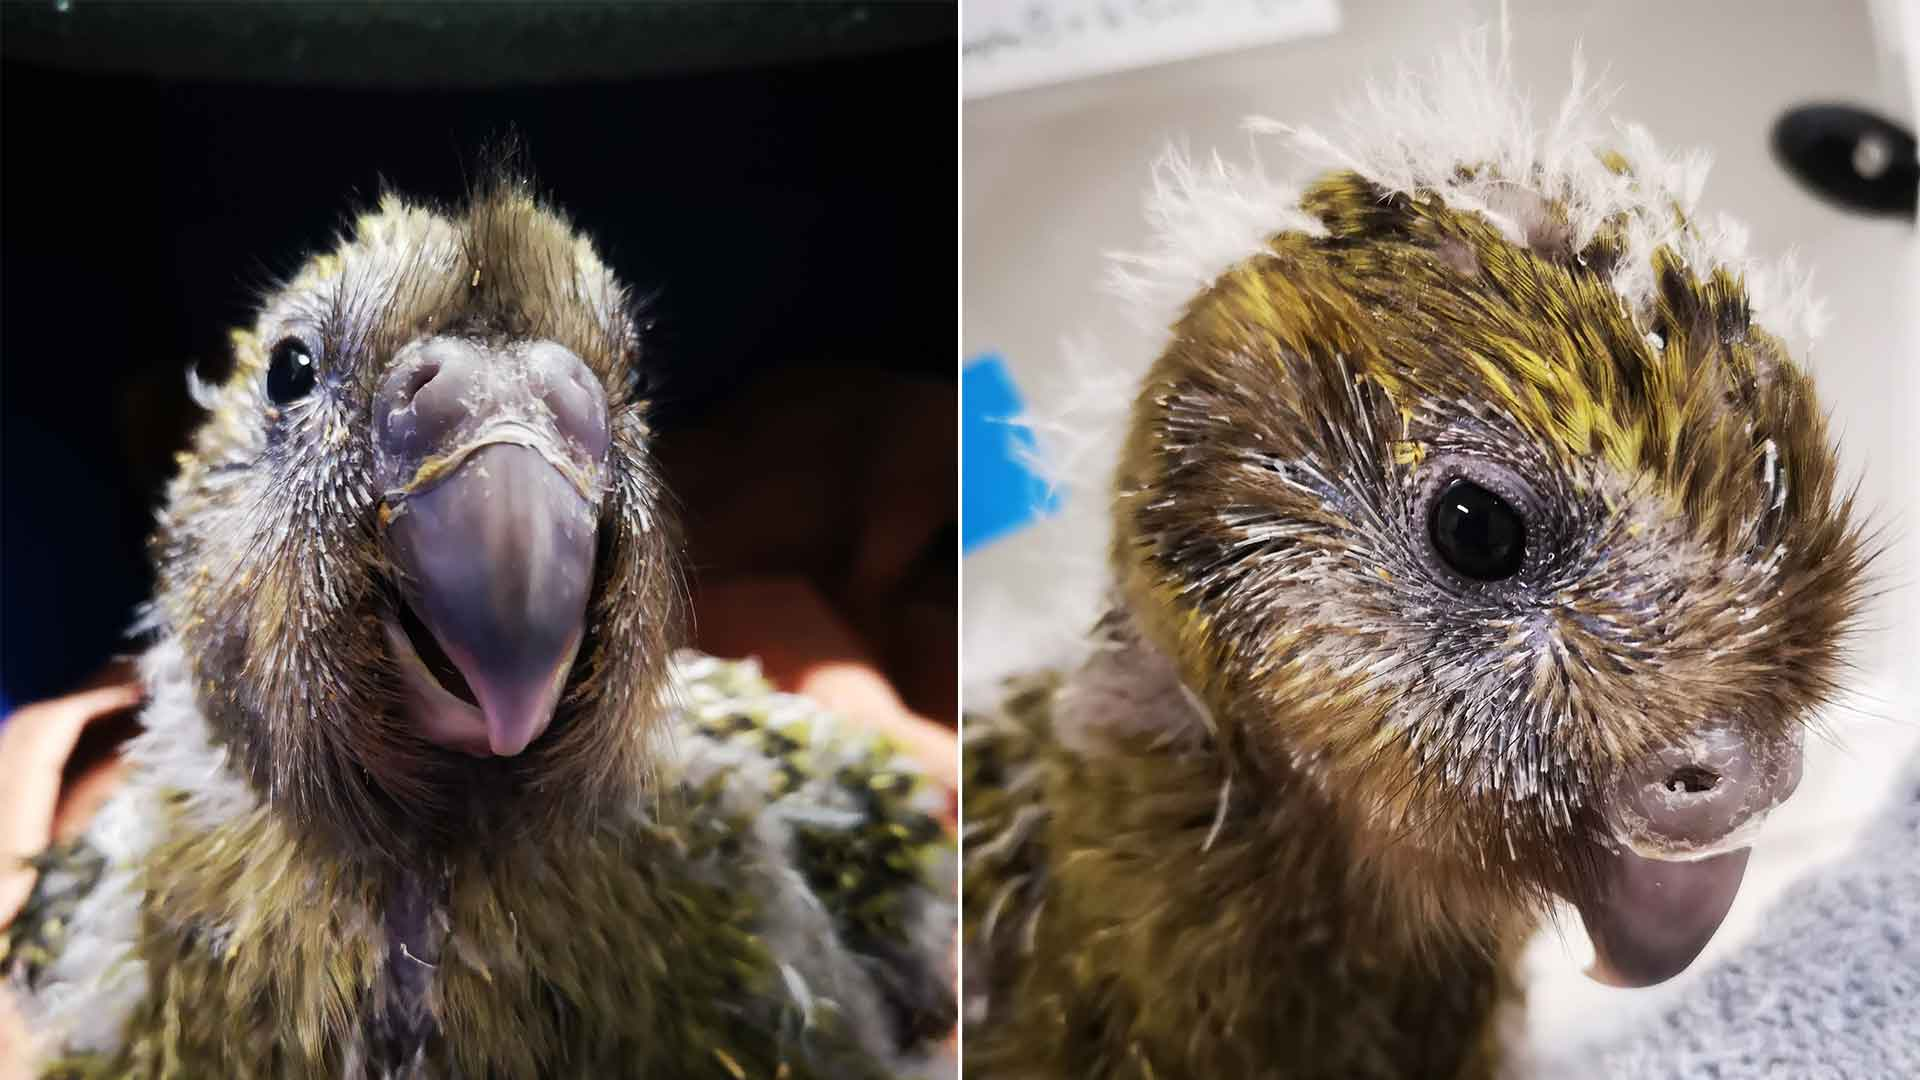 https://rfacdn.nz/zoo/assets/media/kakapo-esperg-2b-second-gallery.jpg